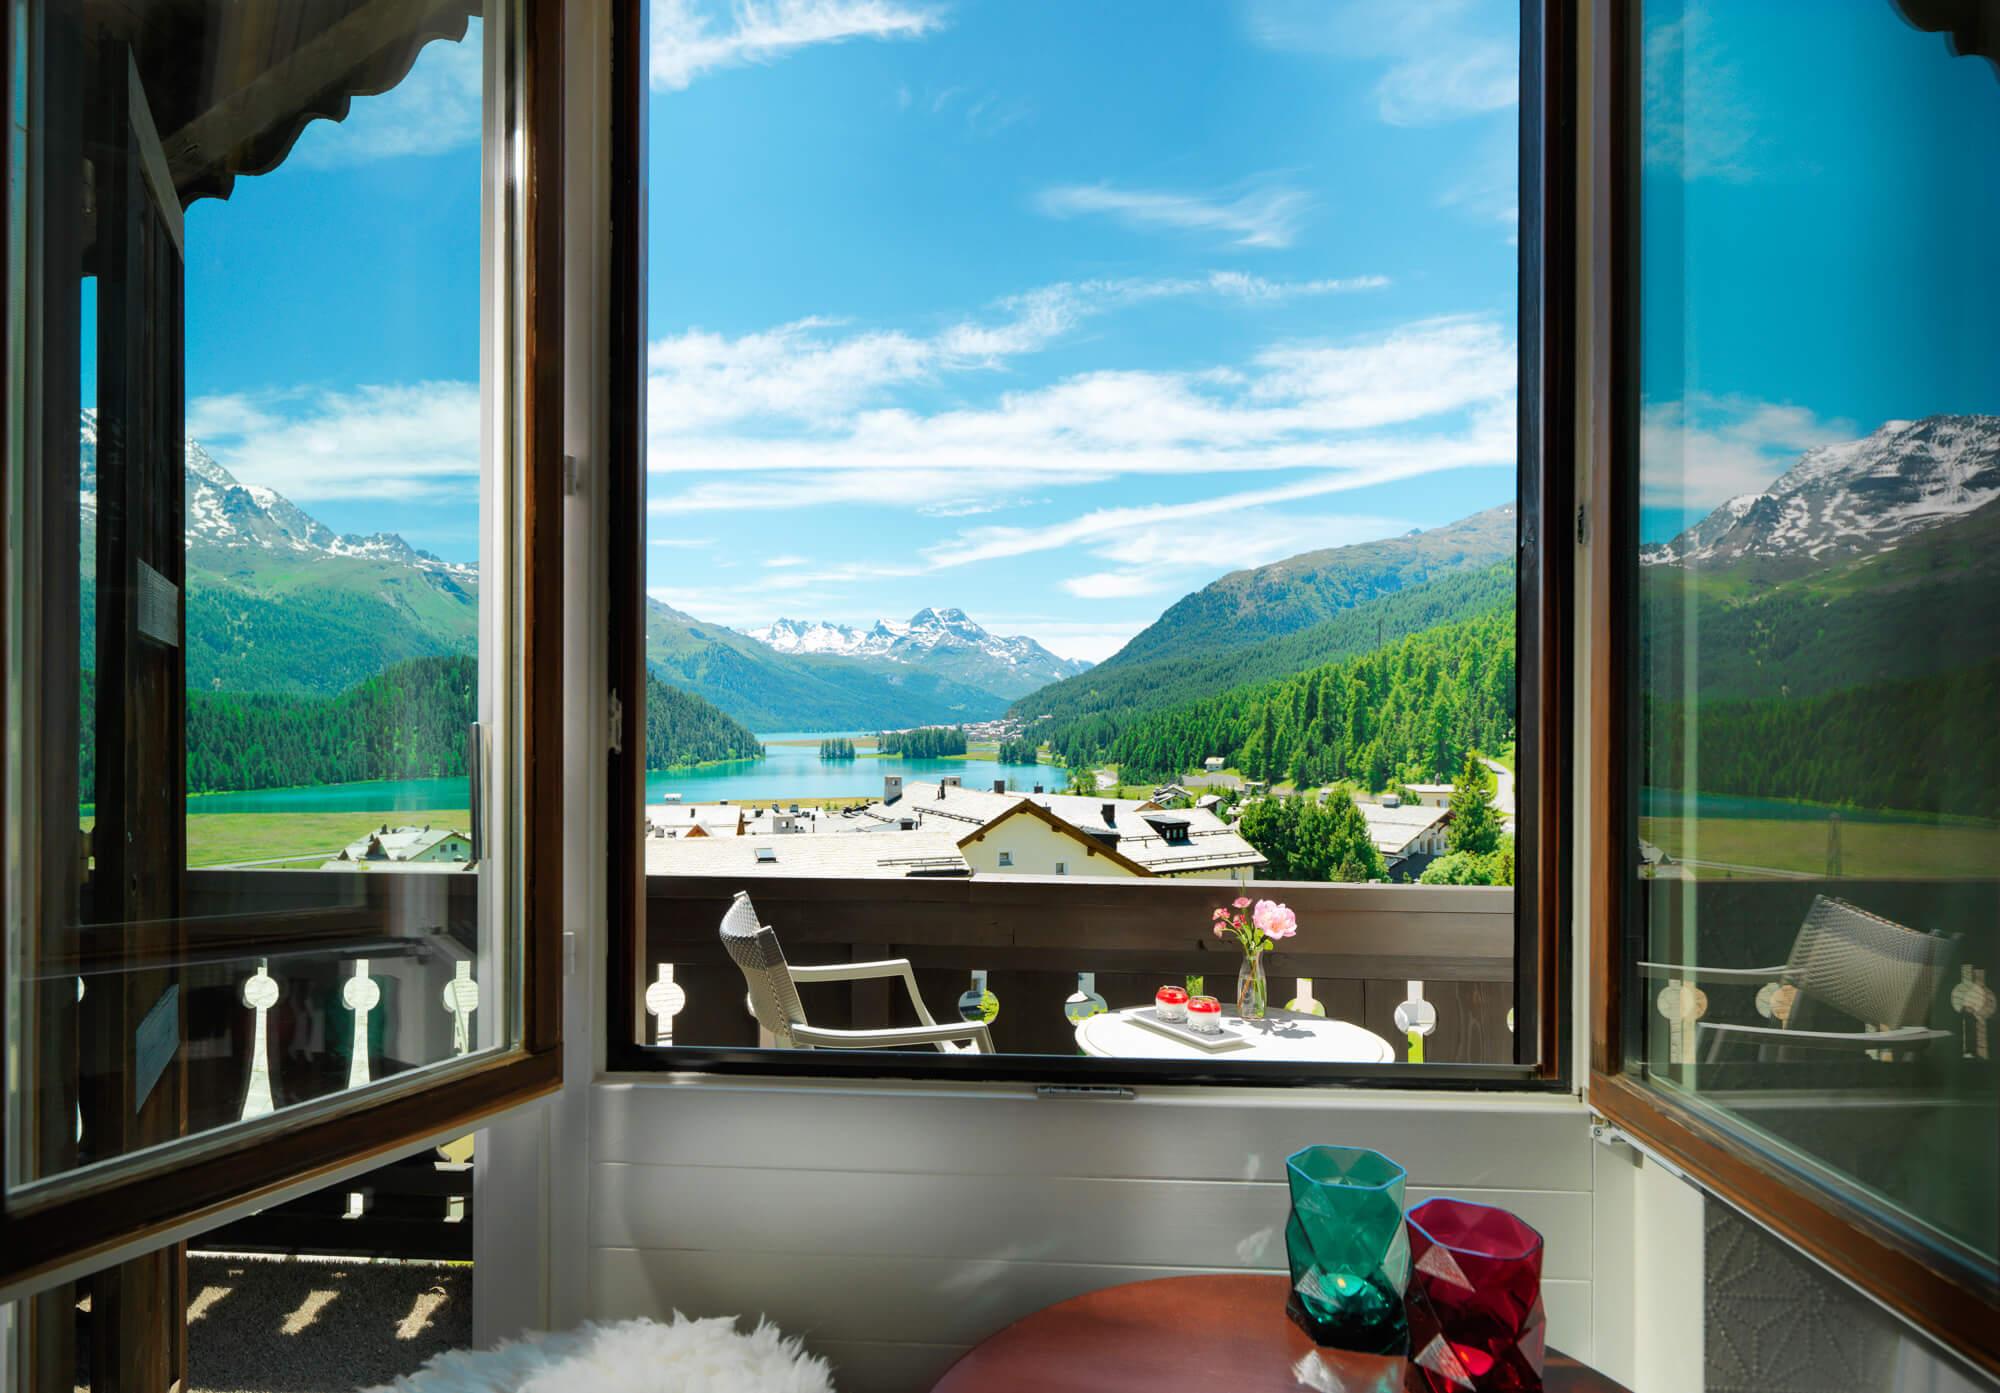 Hotel giardino mountain engadine s power retreat